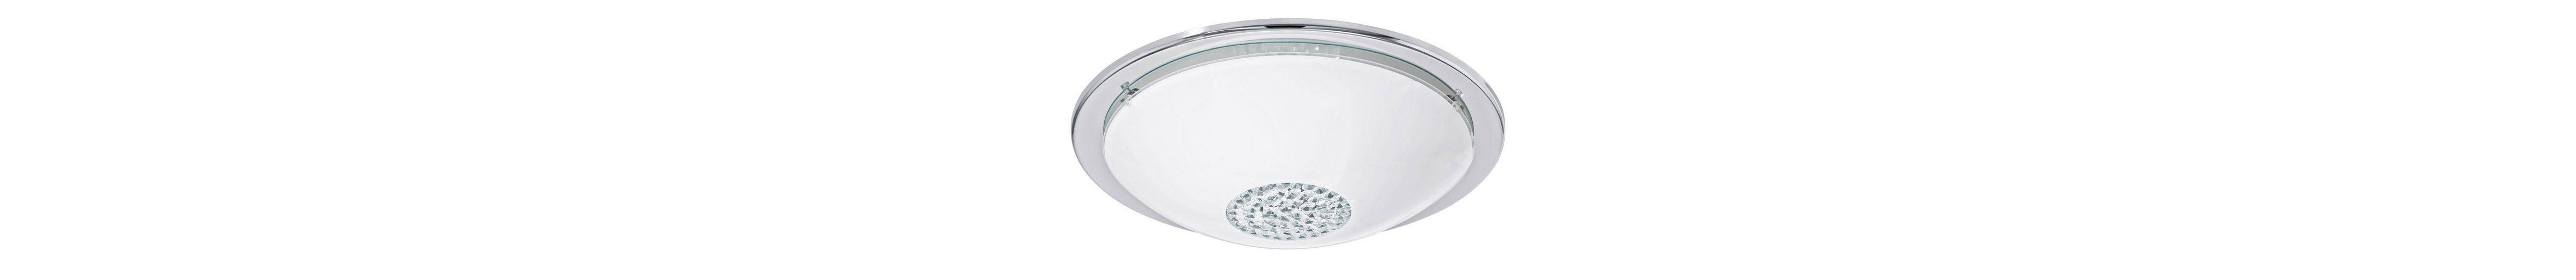 Eglo LED-Deckenleuchte, 1flg., »GIOLINA«